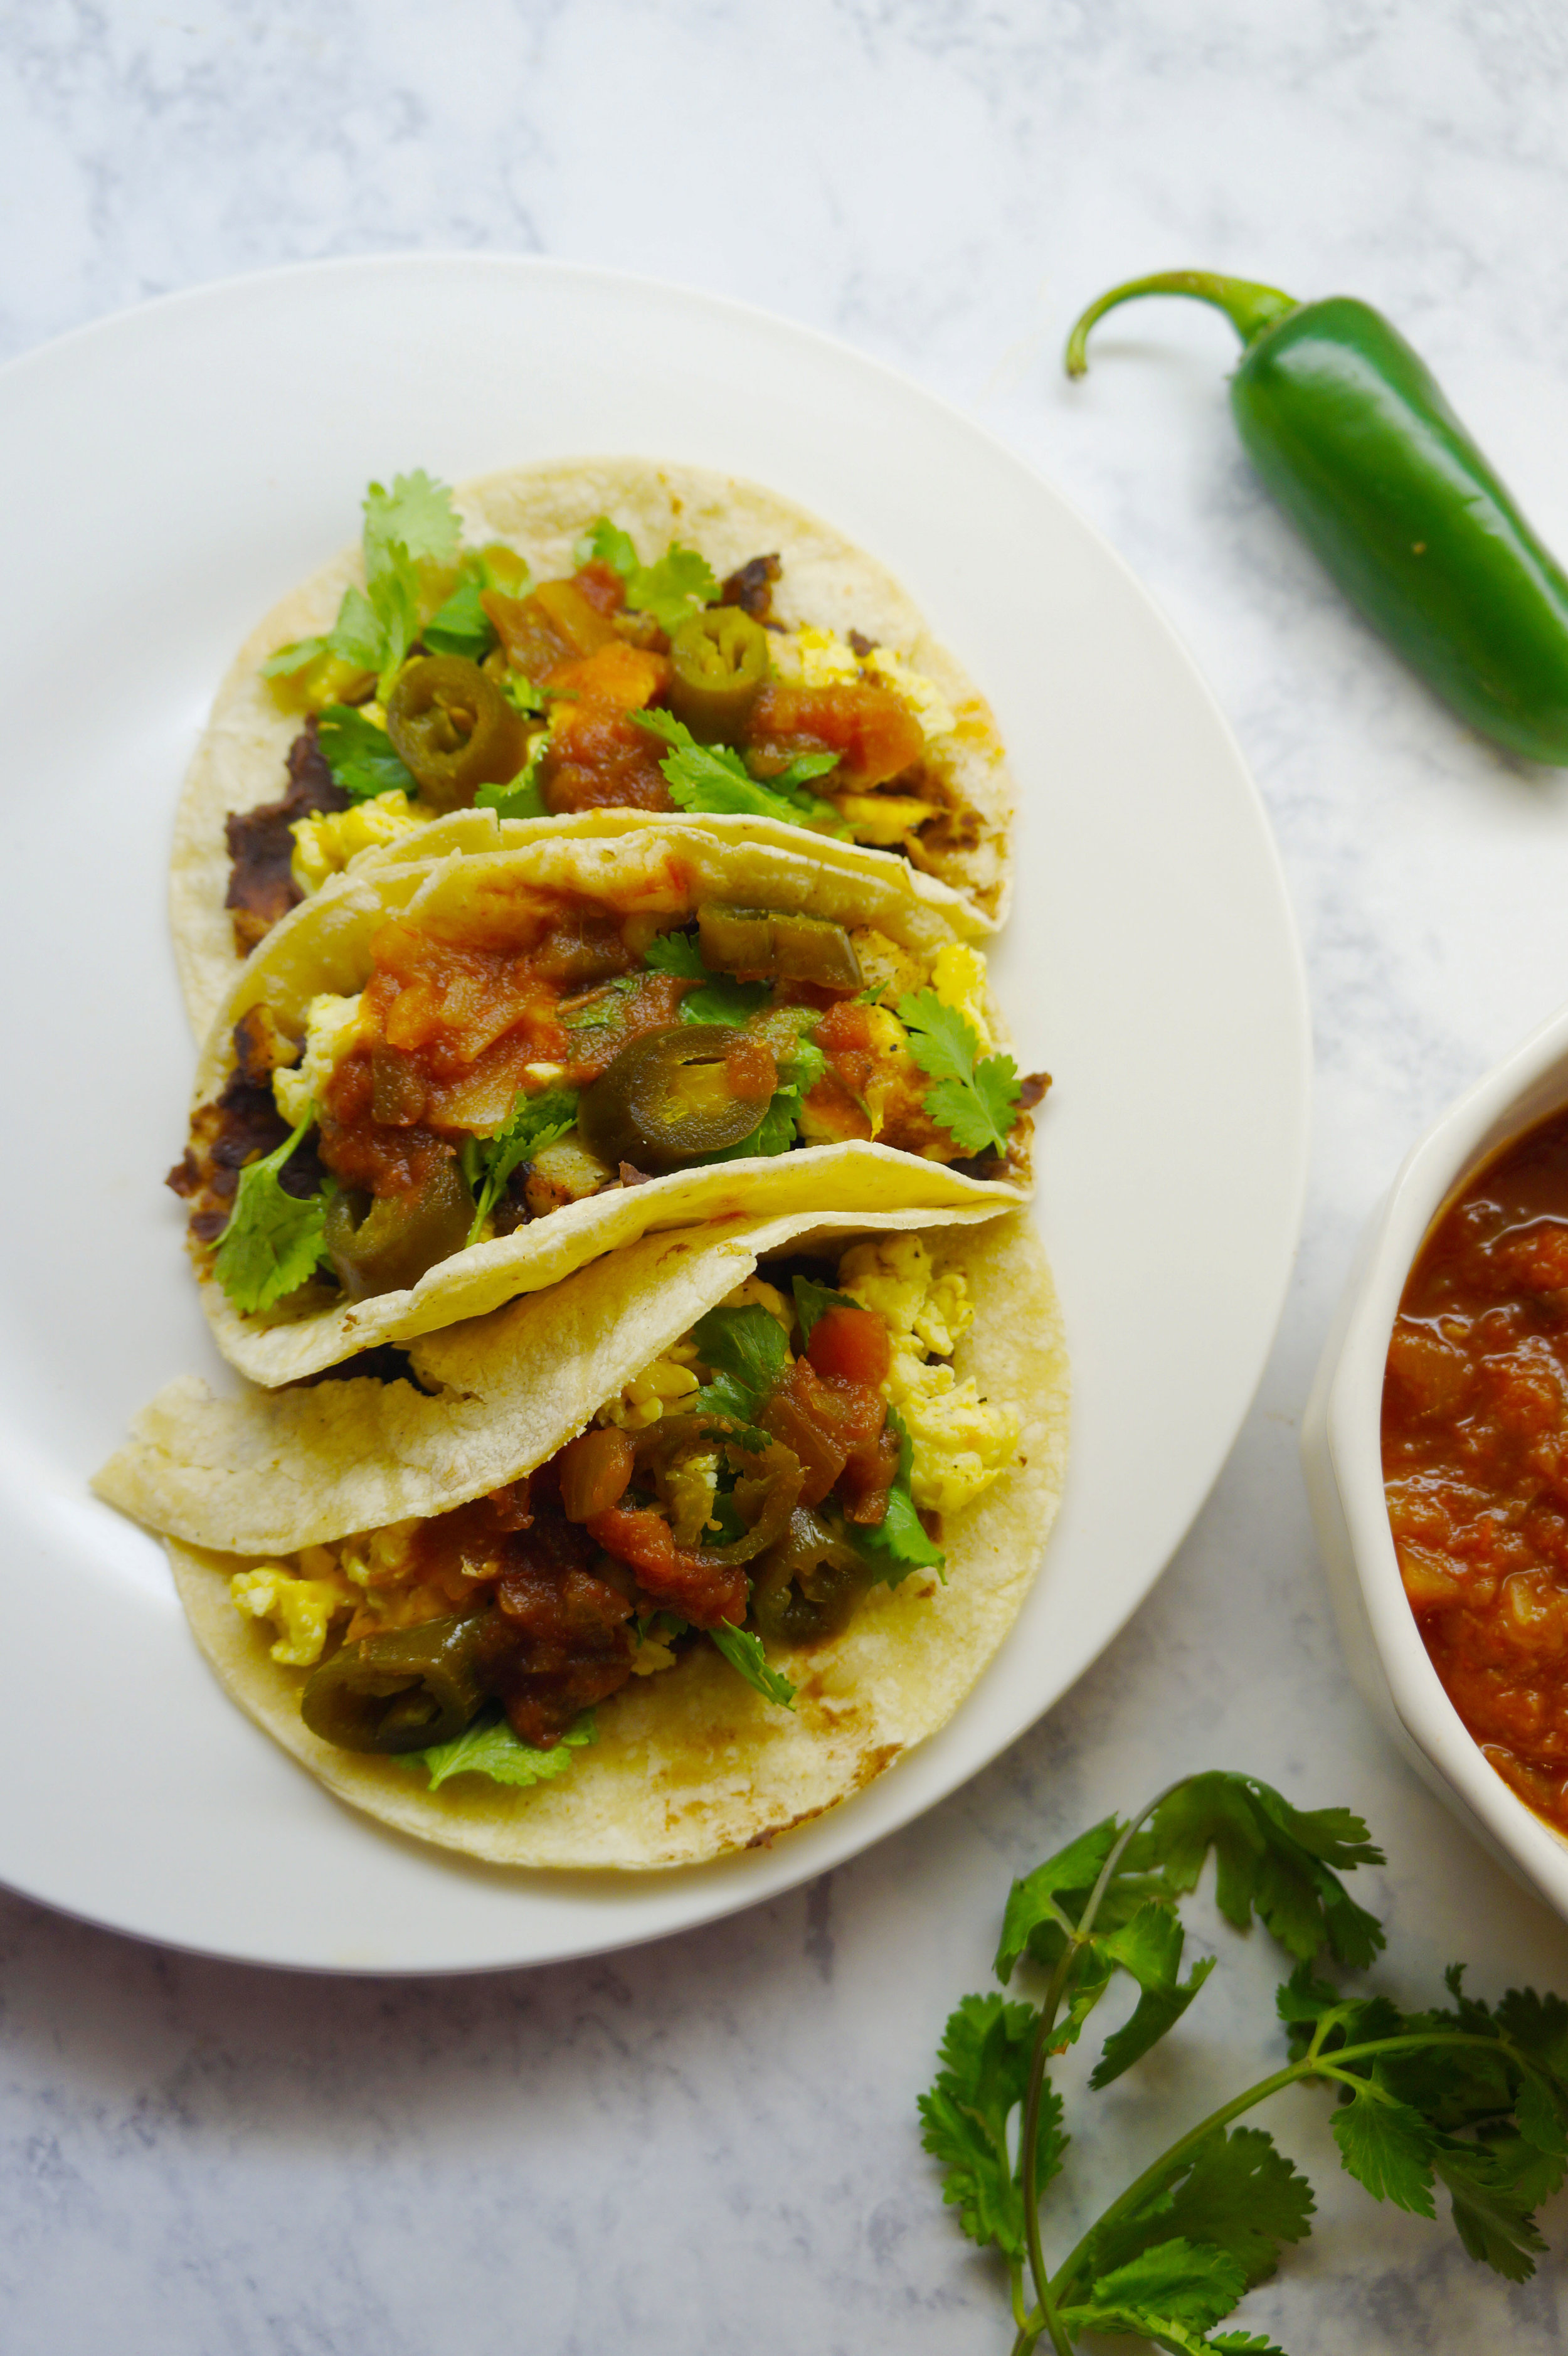 Andrea Fenise Memphis Fashion and Memphis Food Blogger shares a breakfast taco recipe